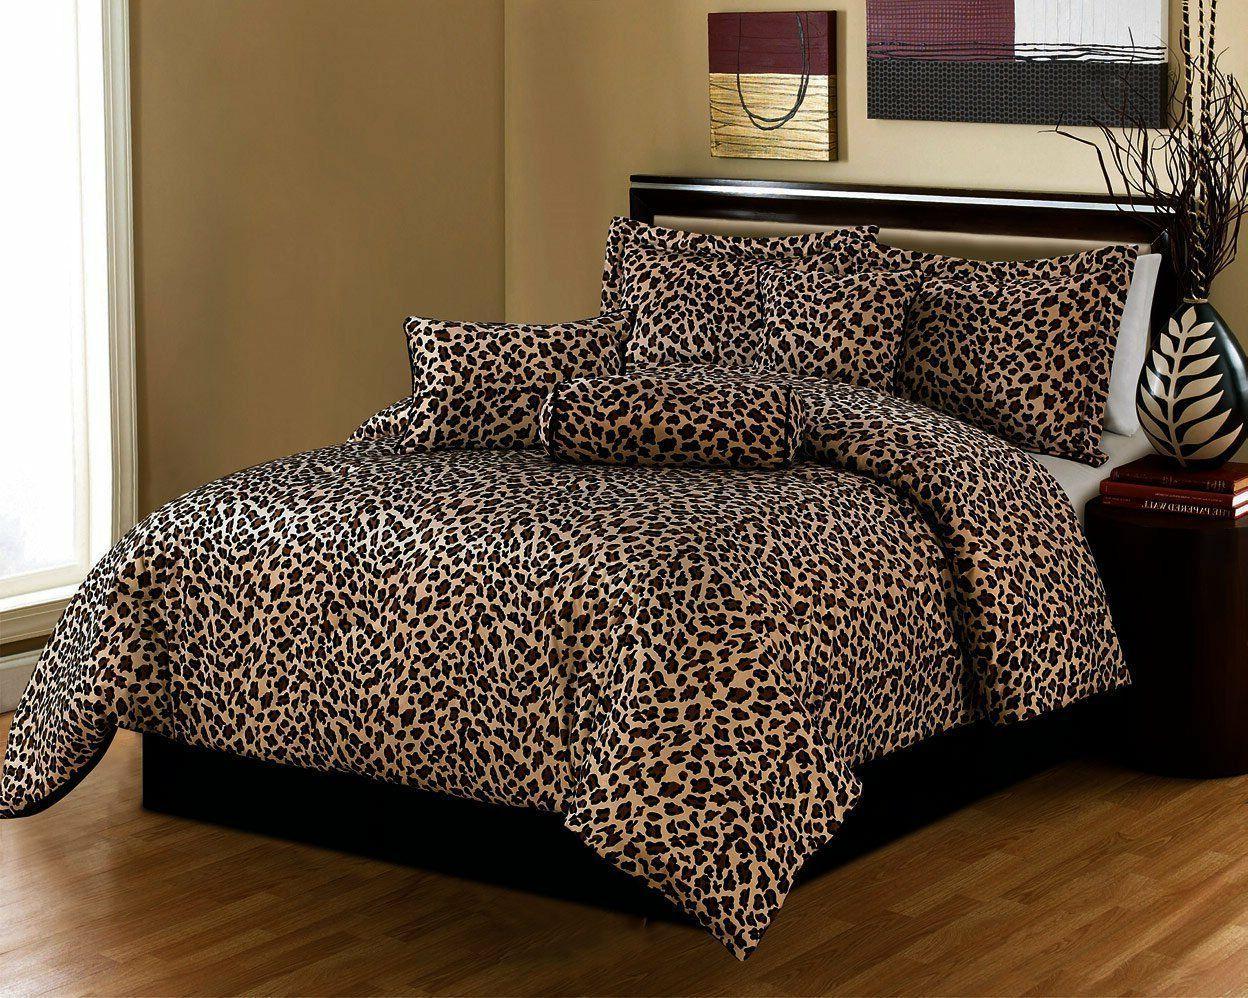 Luxury 7 Piece Safari Leopard Print Micro Fur Bedding Comfor